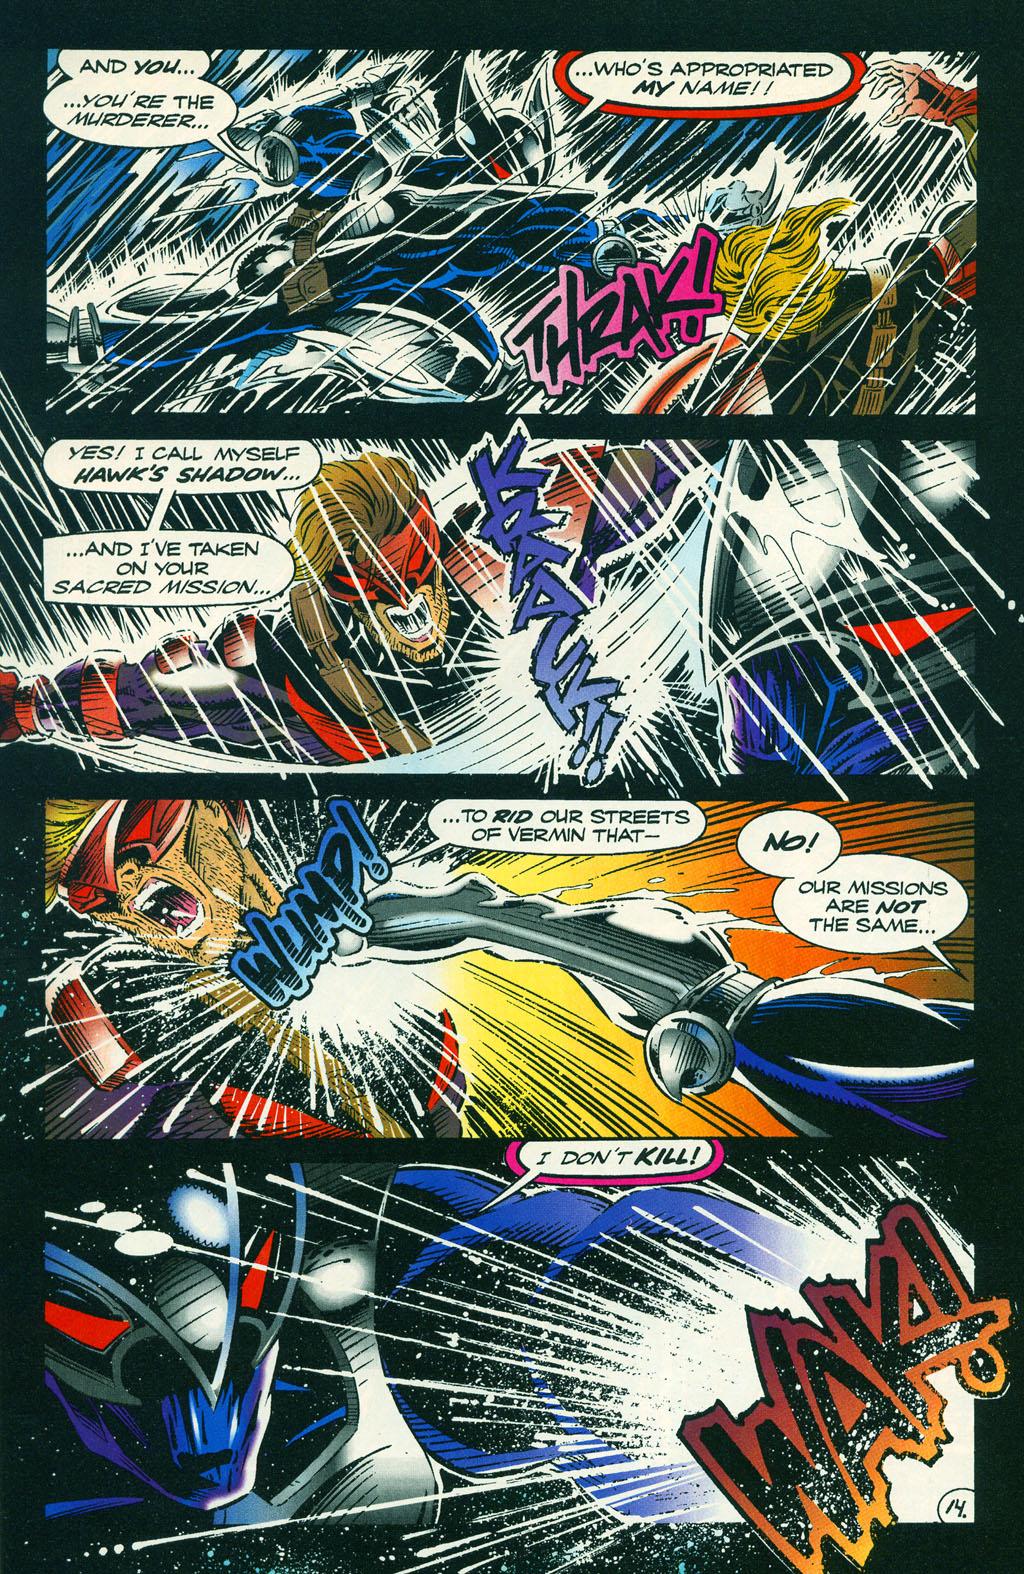 Read online ShadowHawk comic -  Issue #6 - 19